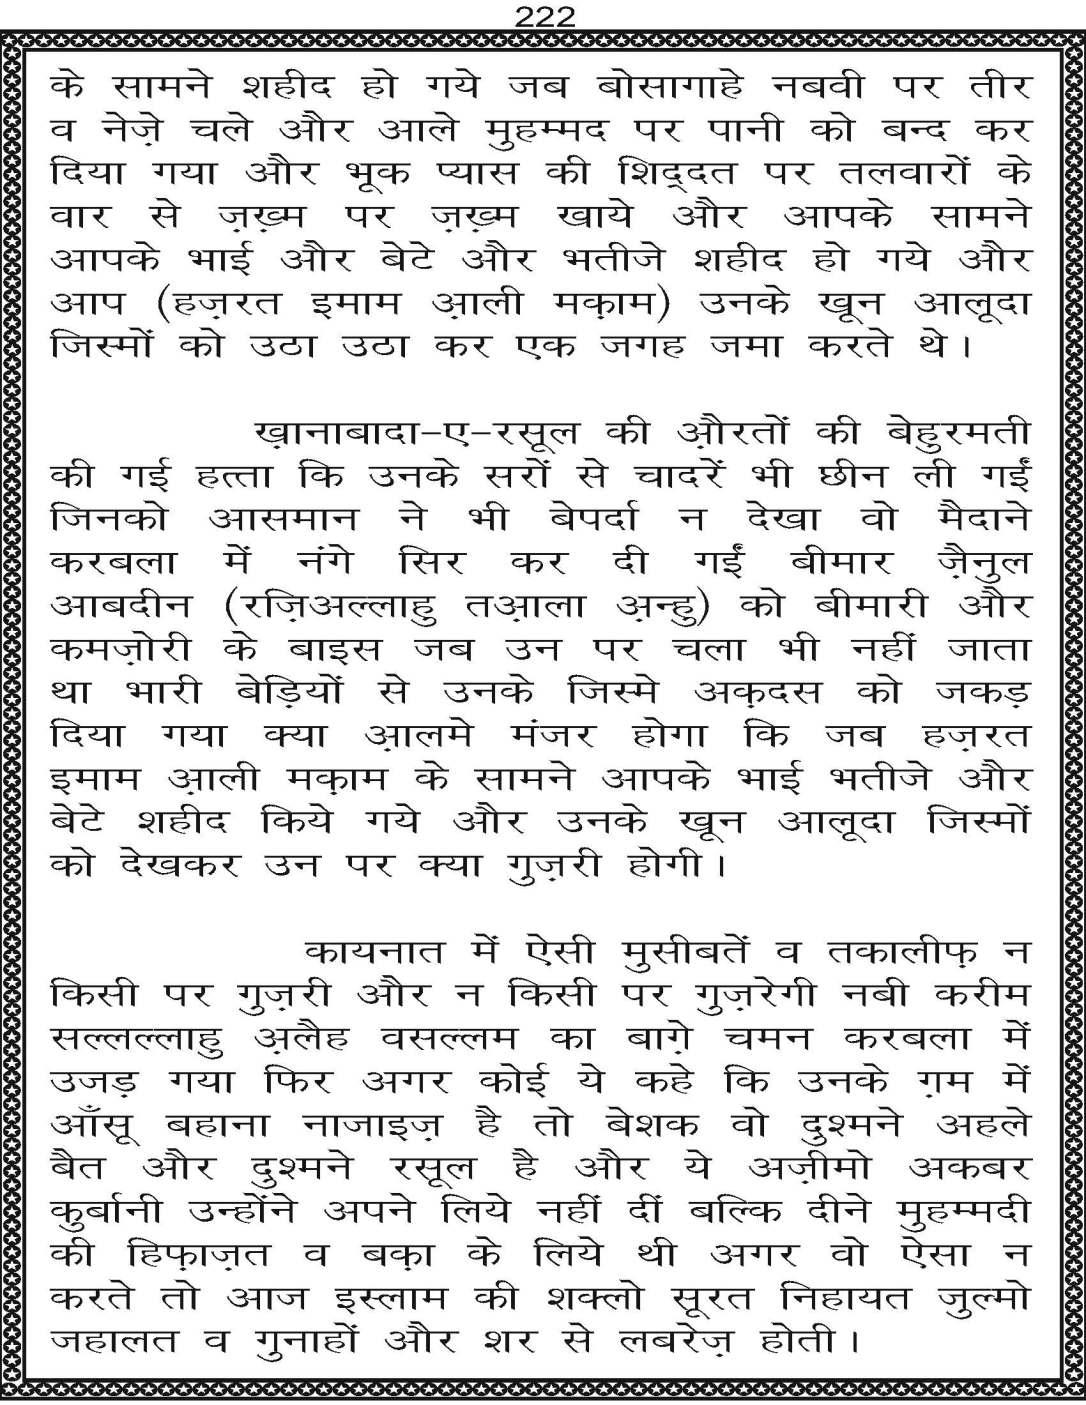 AzmateTaziyadari_Page_222